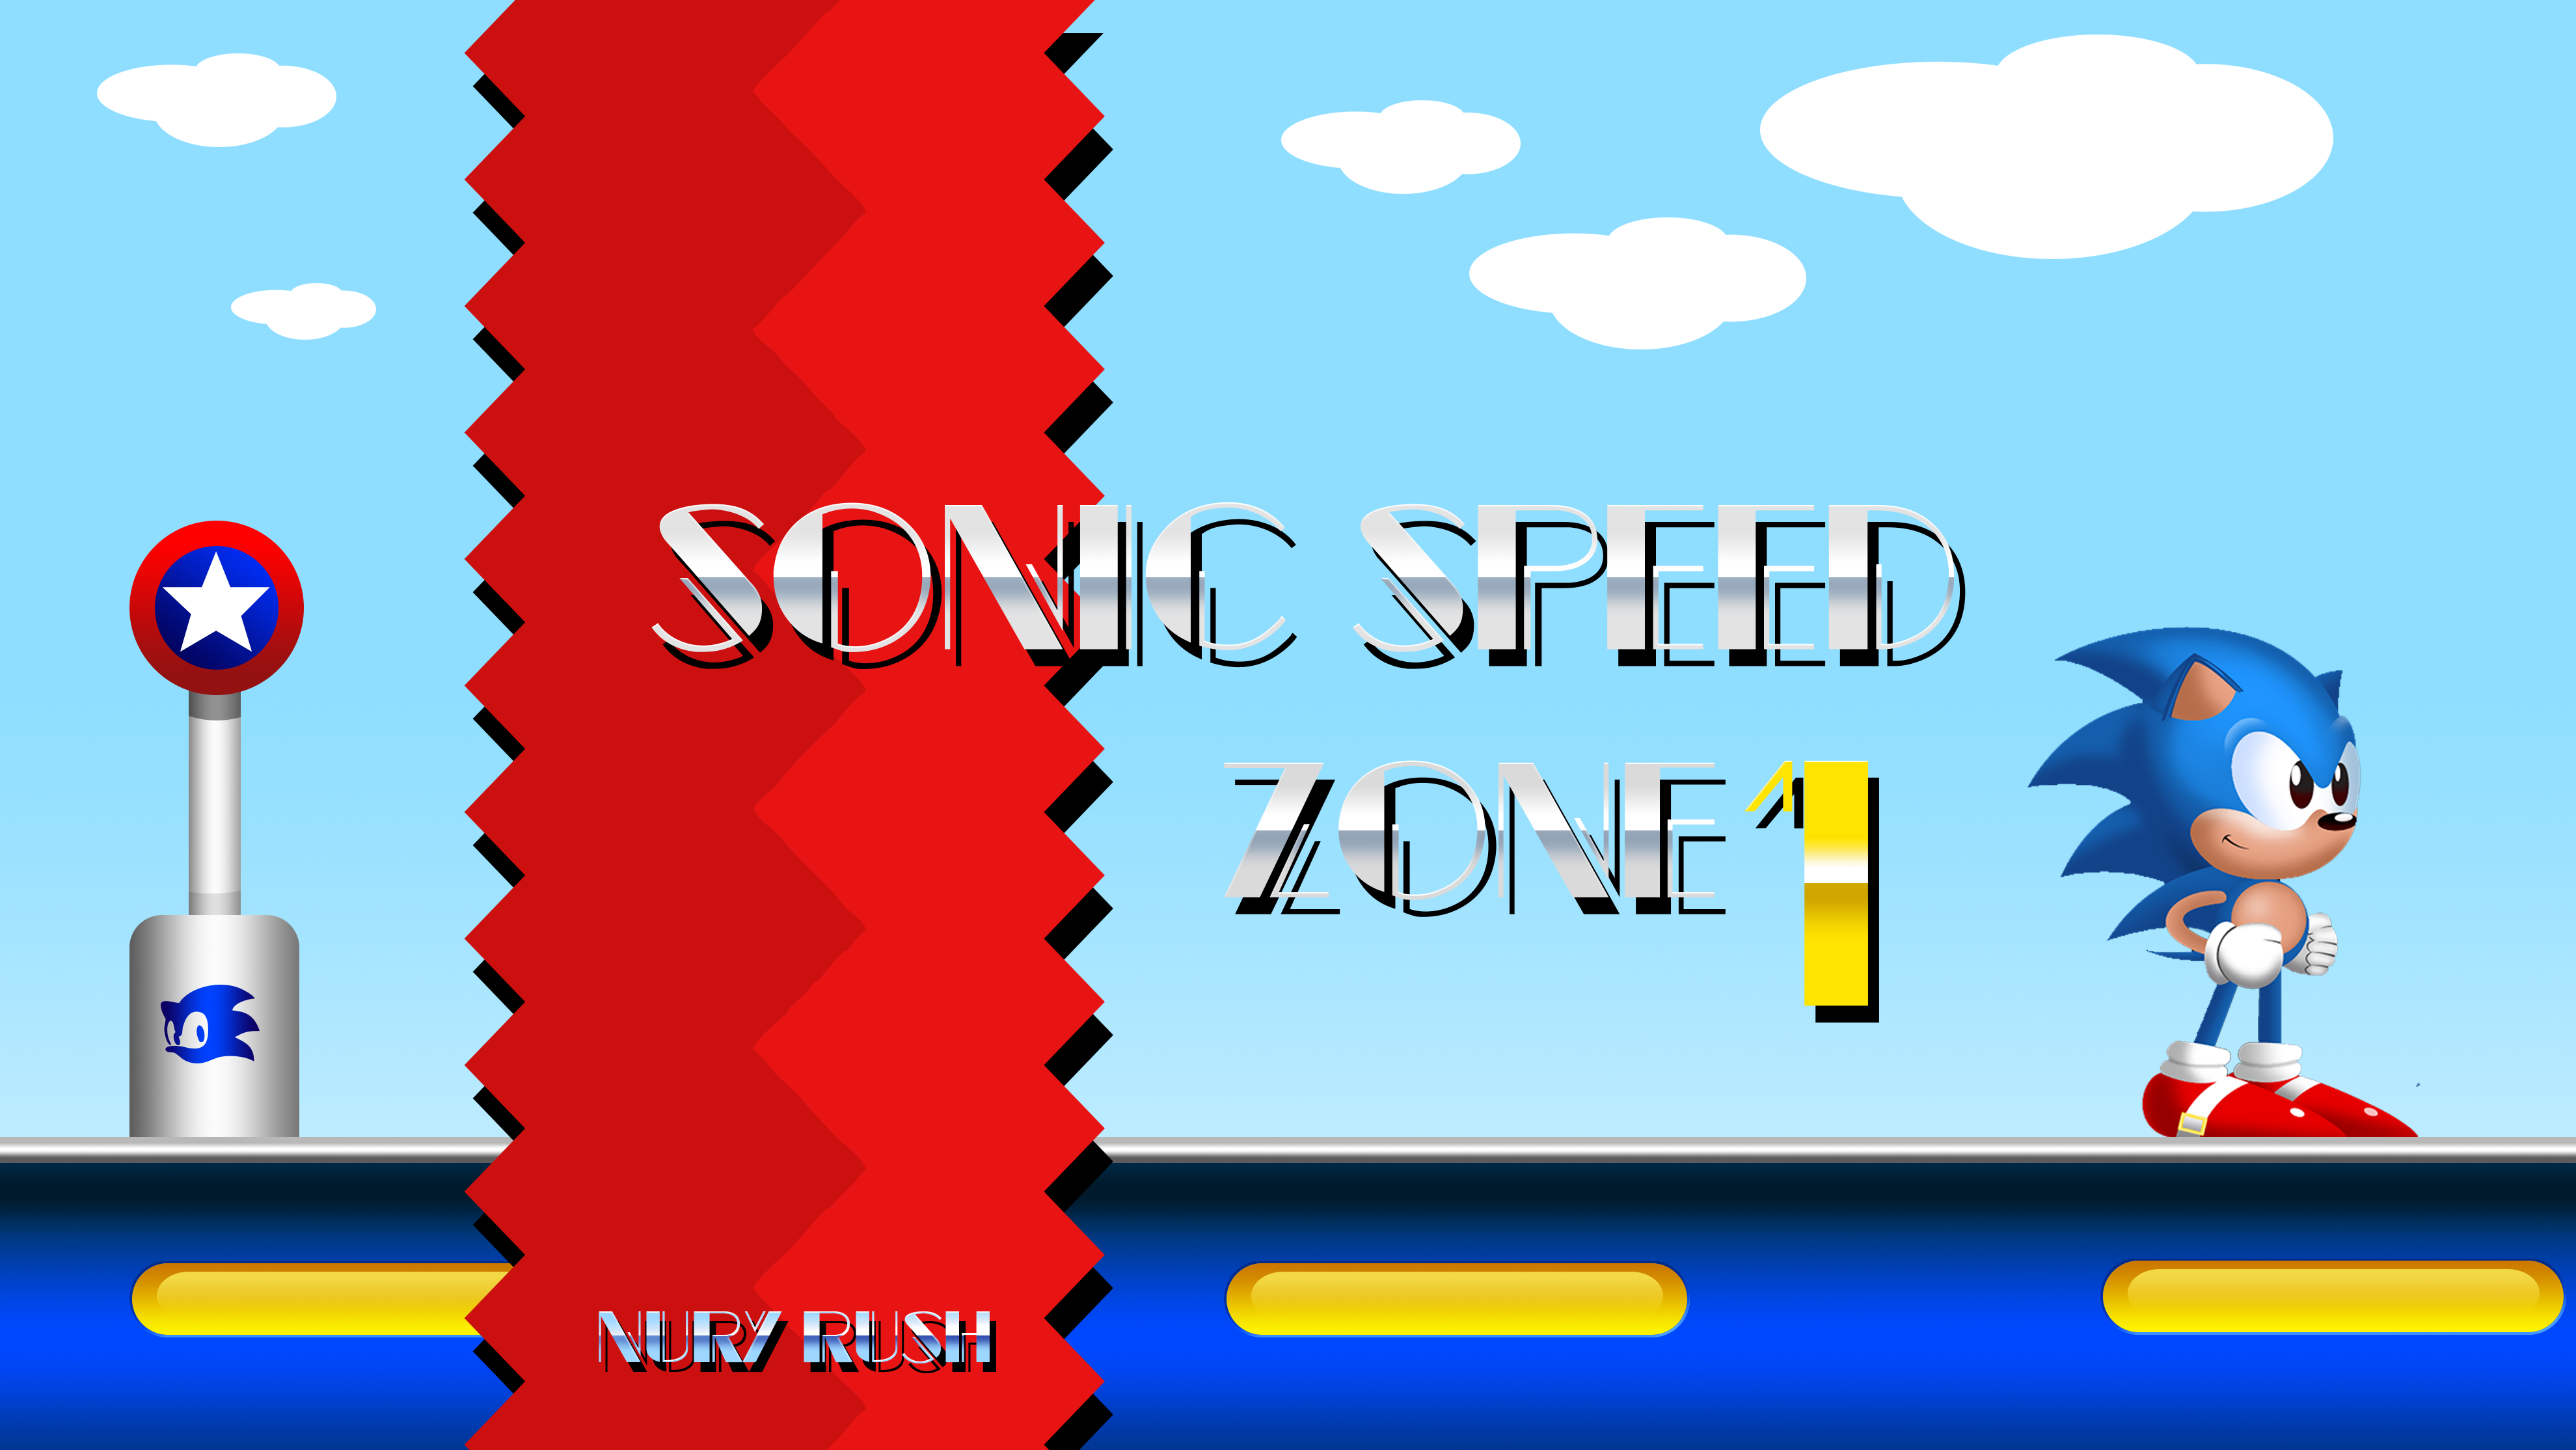 Sonic Speed Zone S2HD Style by NuryRush